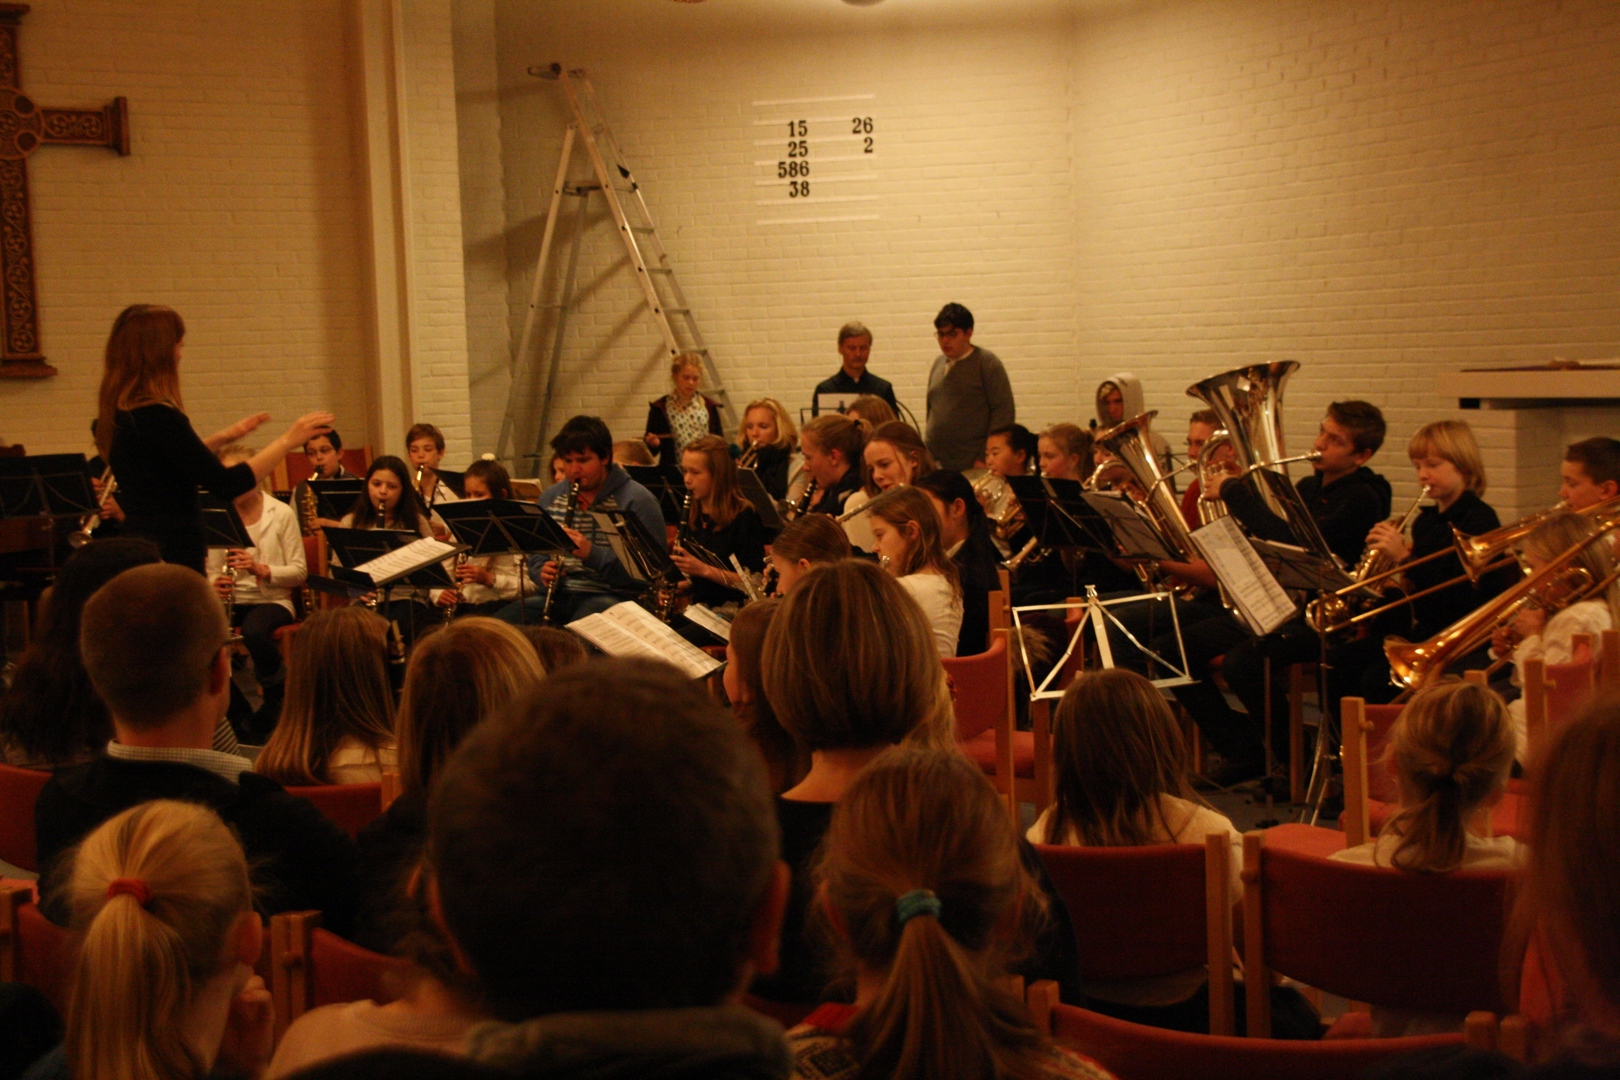 Ensemblemønstring i Voksen kirke